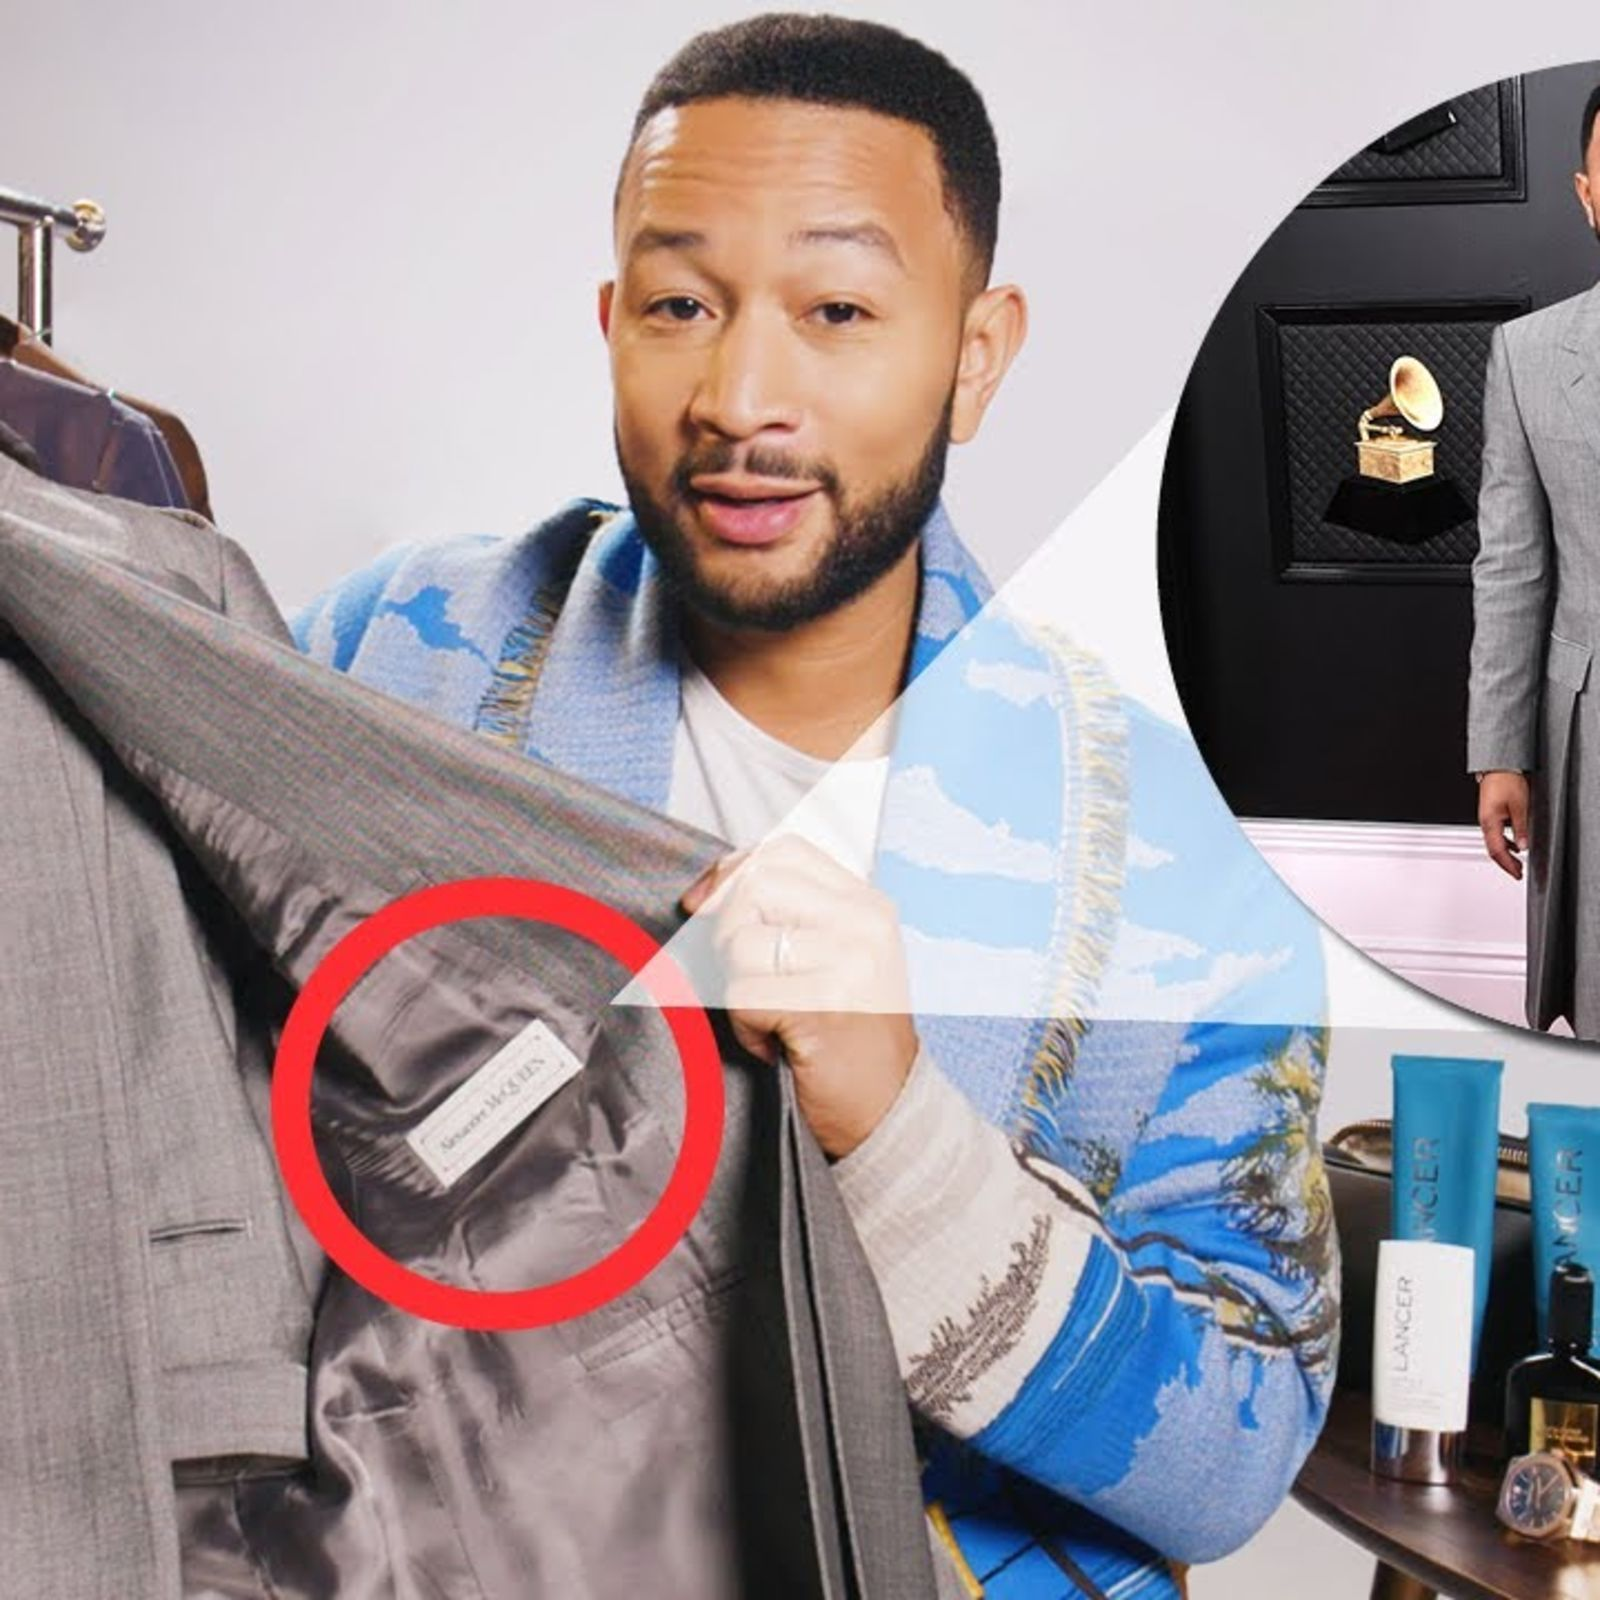 John Legend takes us inside his wardrobe